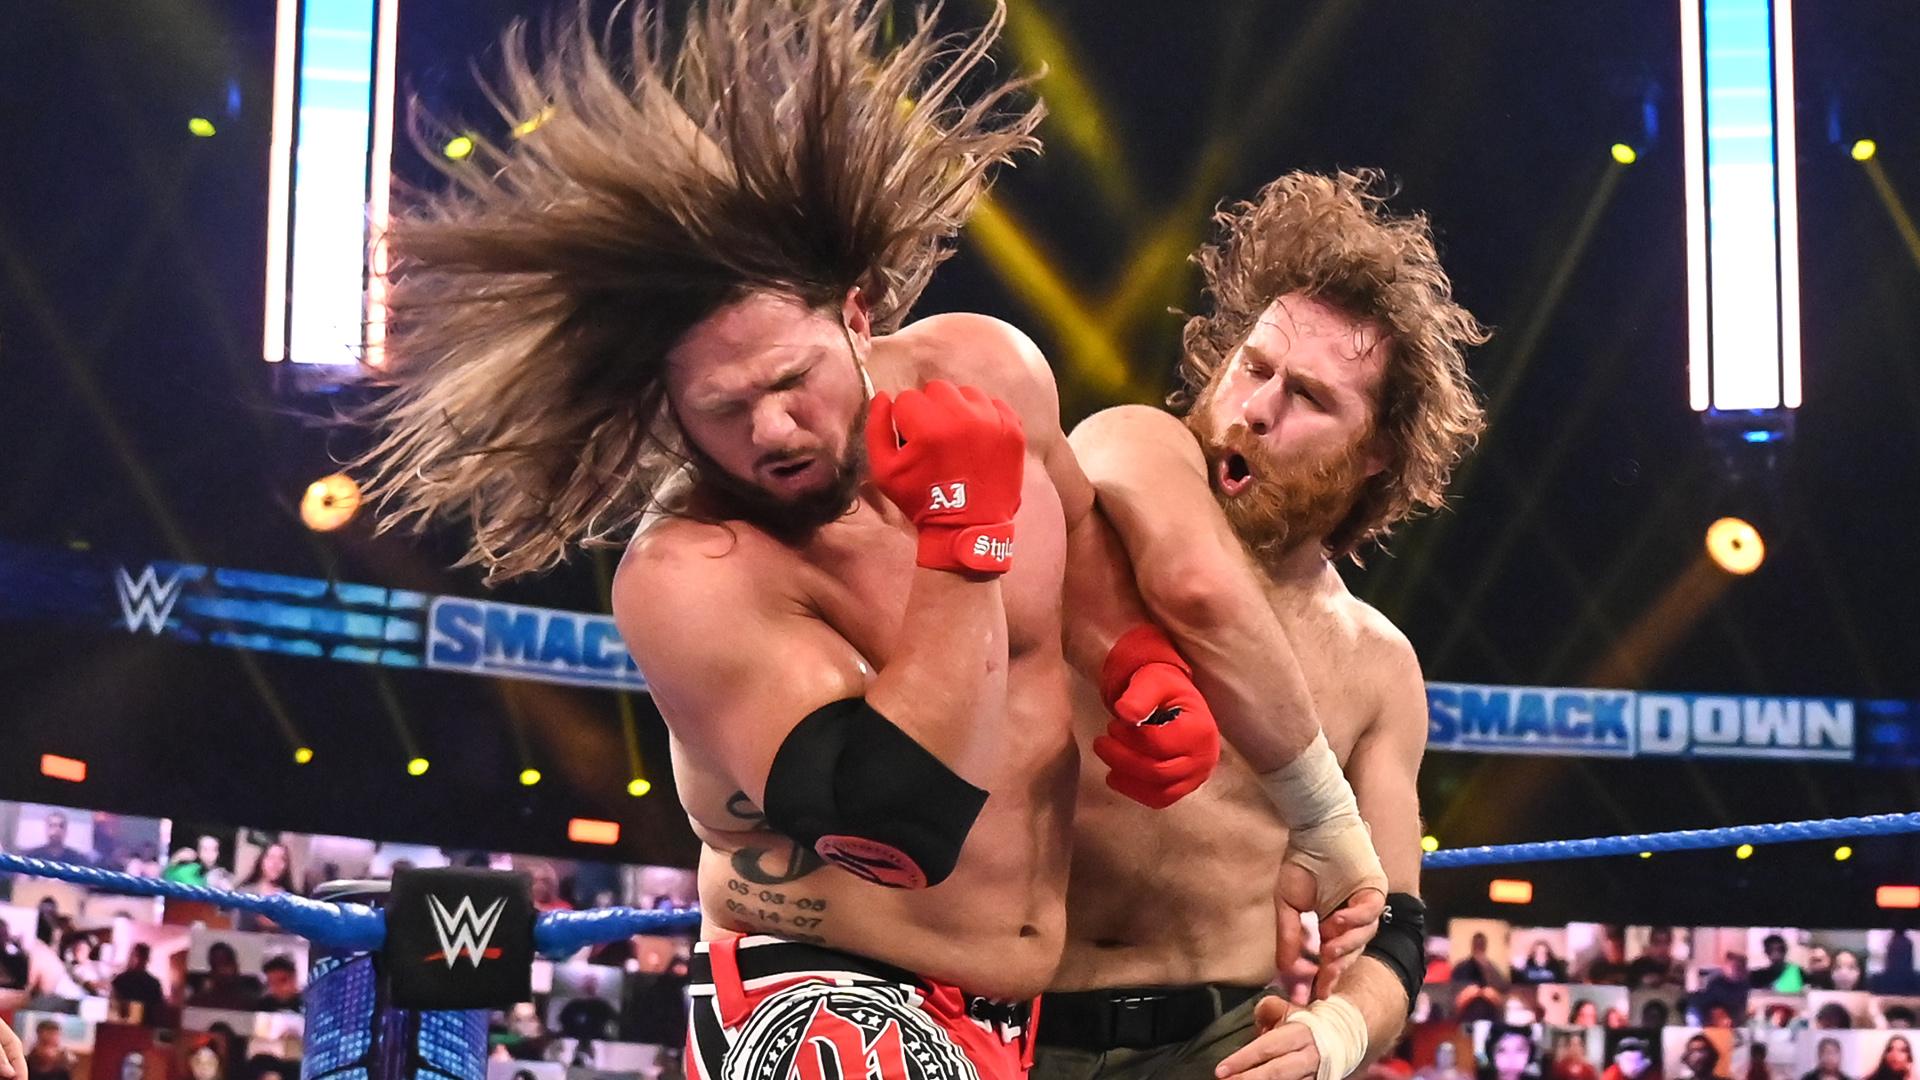 'Triple Threat Ladder Match' acontecerá no Clash of Champions